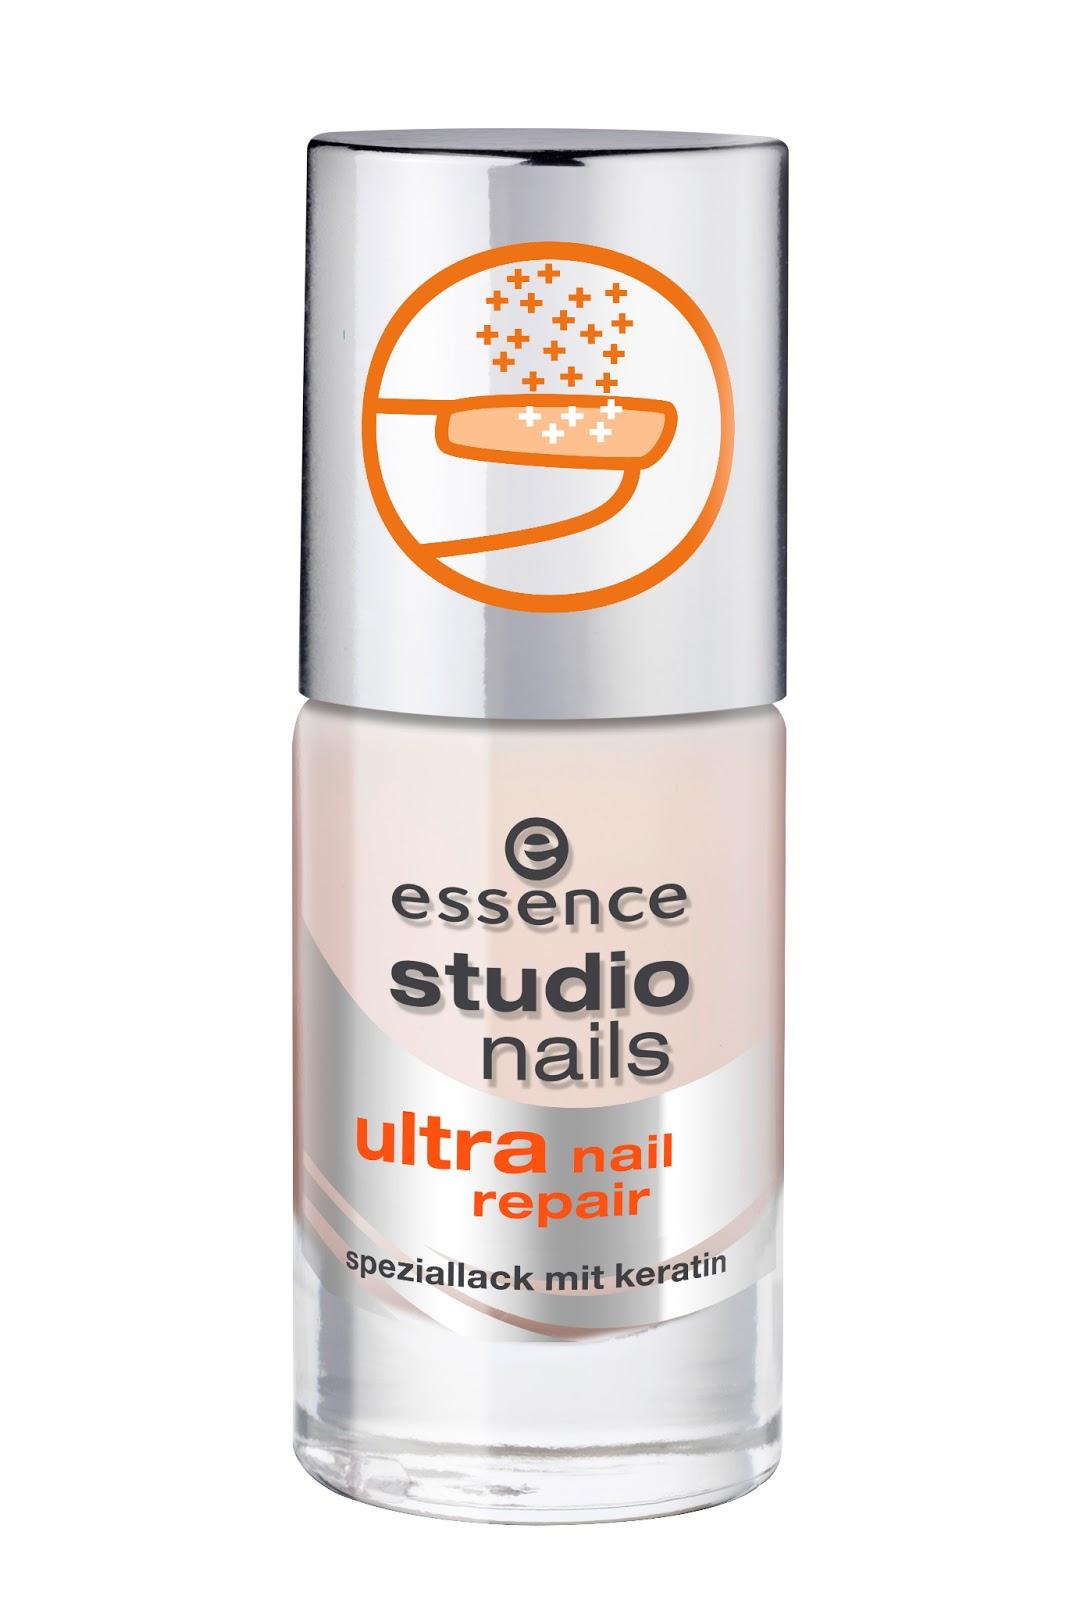 NailArt 101: Nail Design Studio